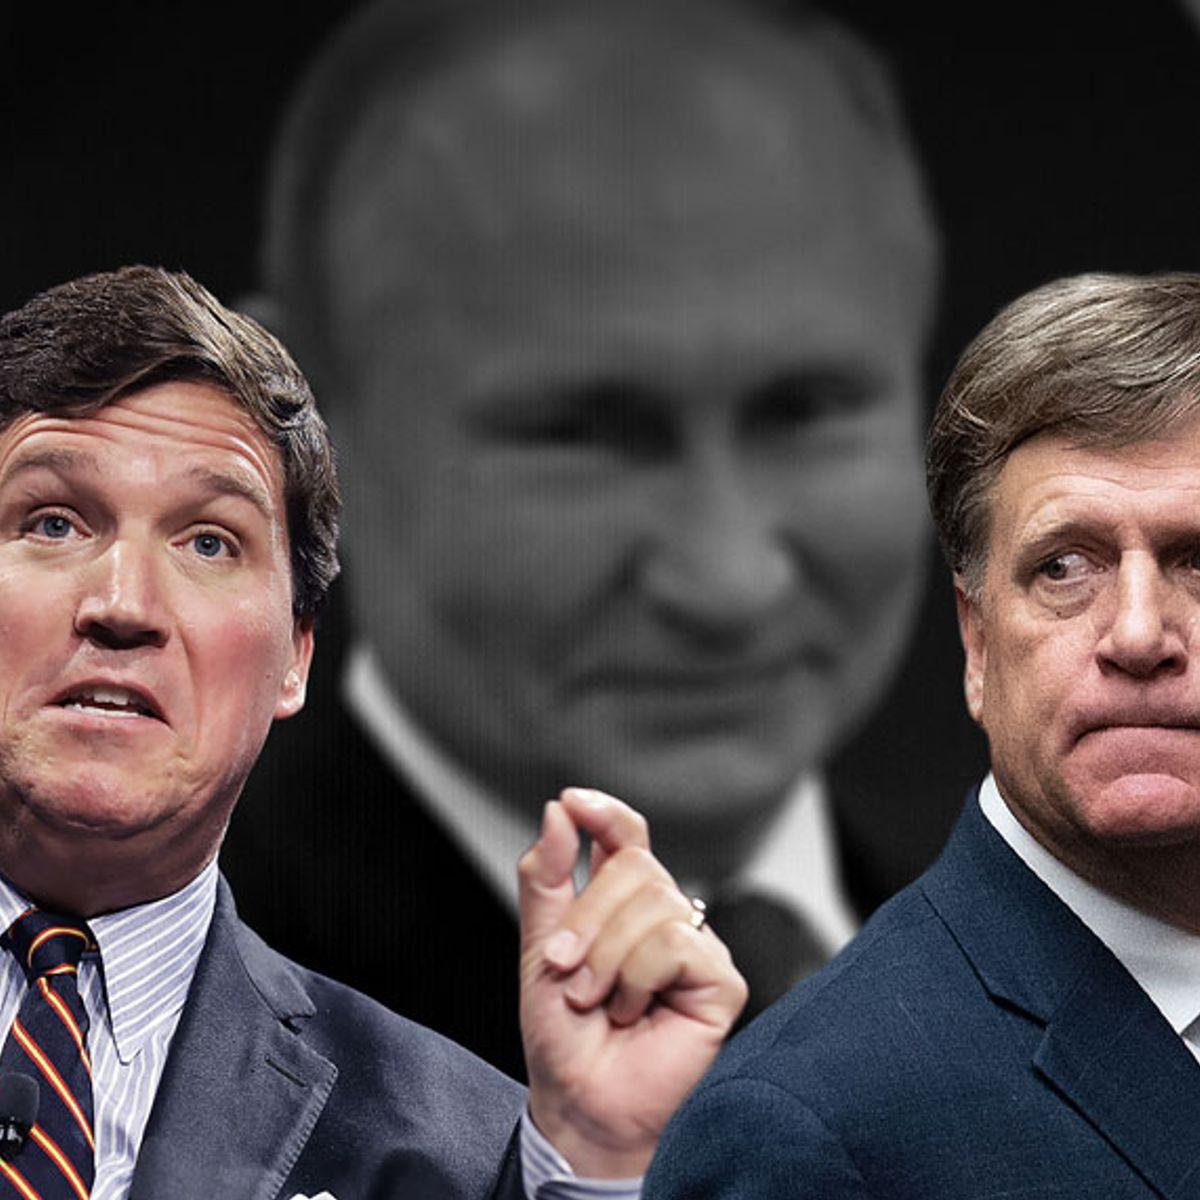 Barack Obama's ambassador to Russia calls out Fox News host Tucker Carlson for defending Putin